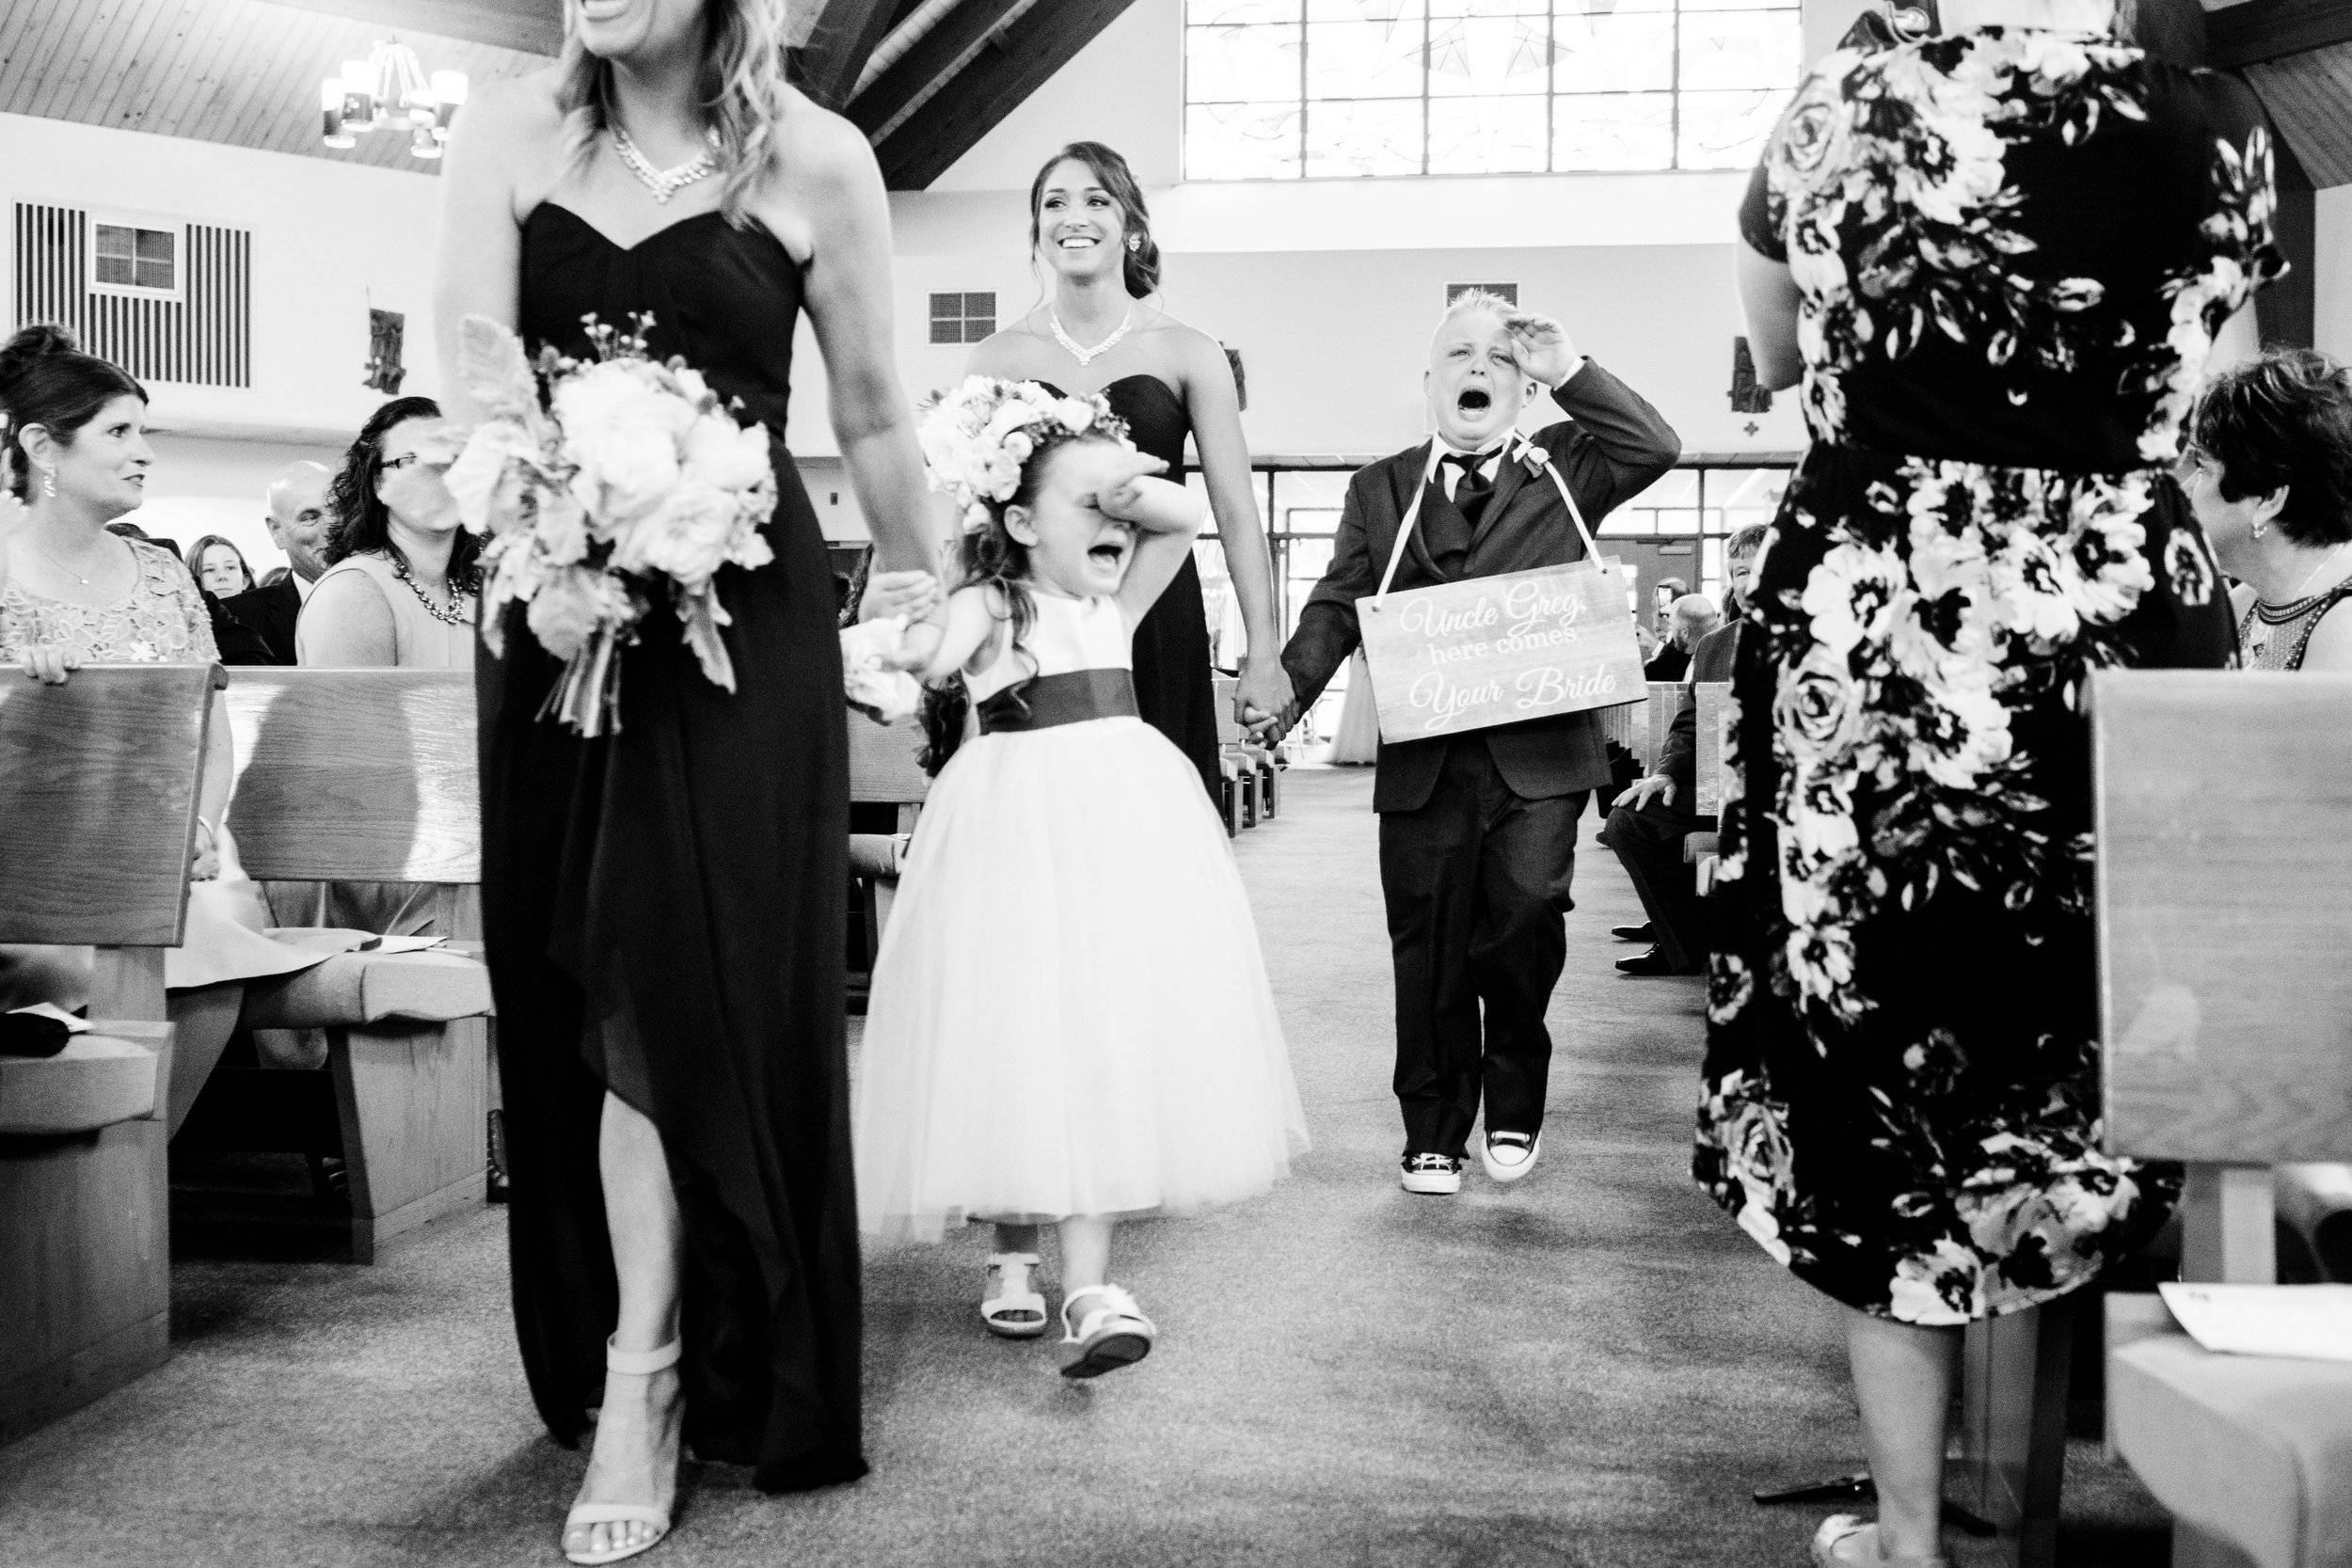 ICONA GOLDEN INN AVALON NJ WEDDING PHOTOGRAPHY  - 037.jpg